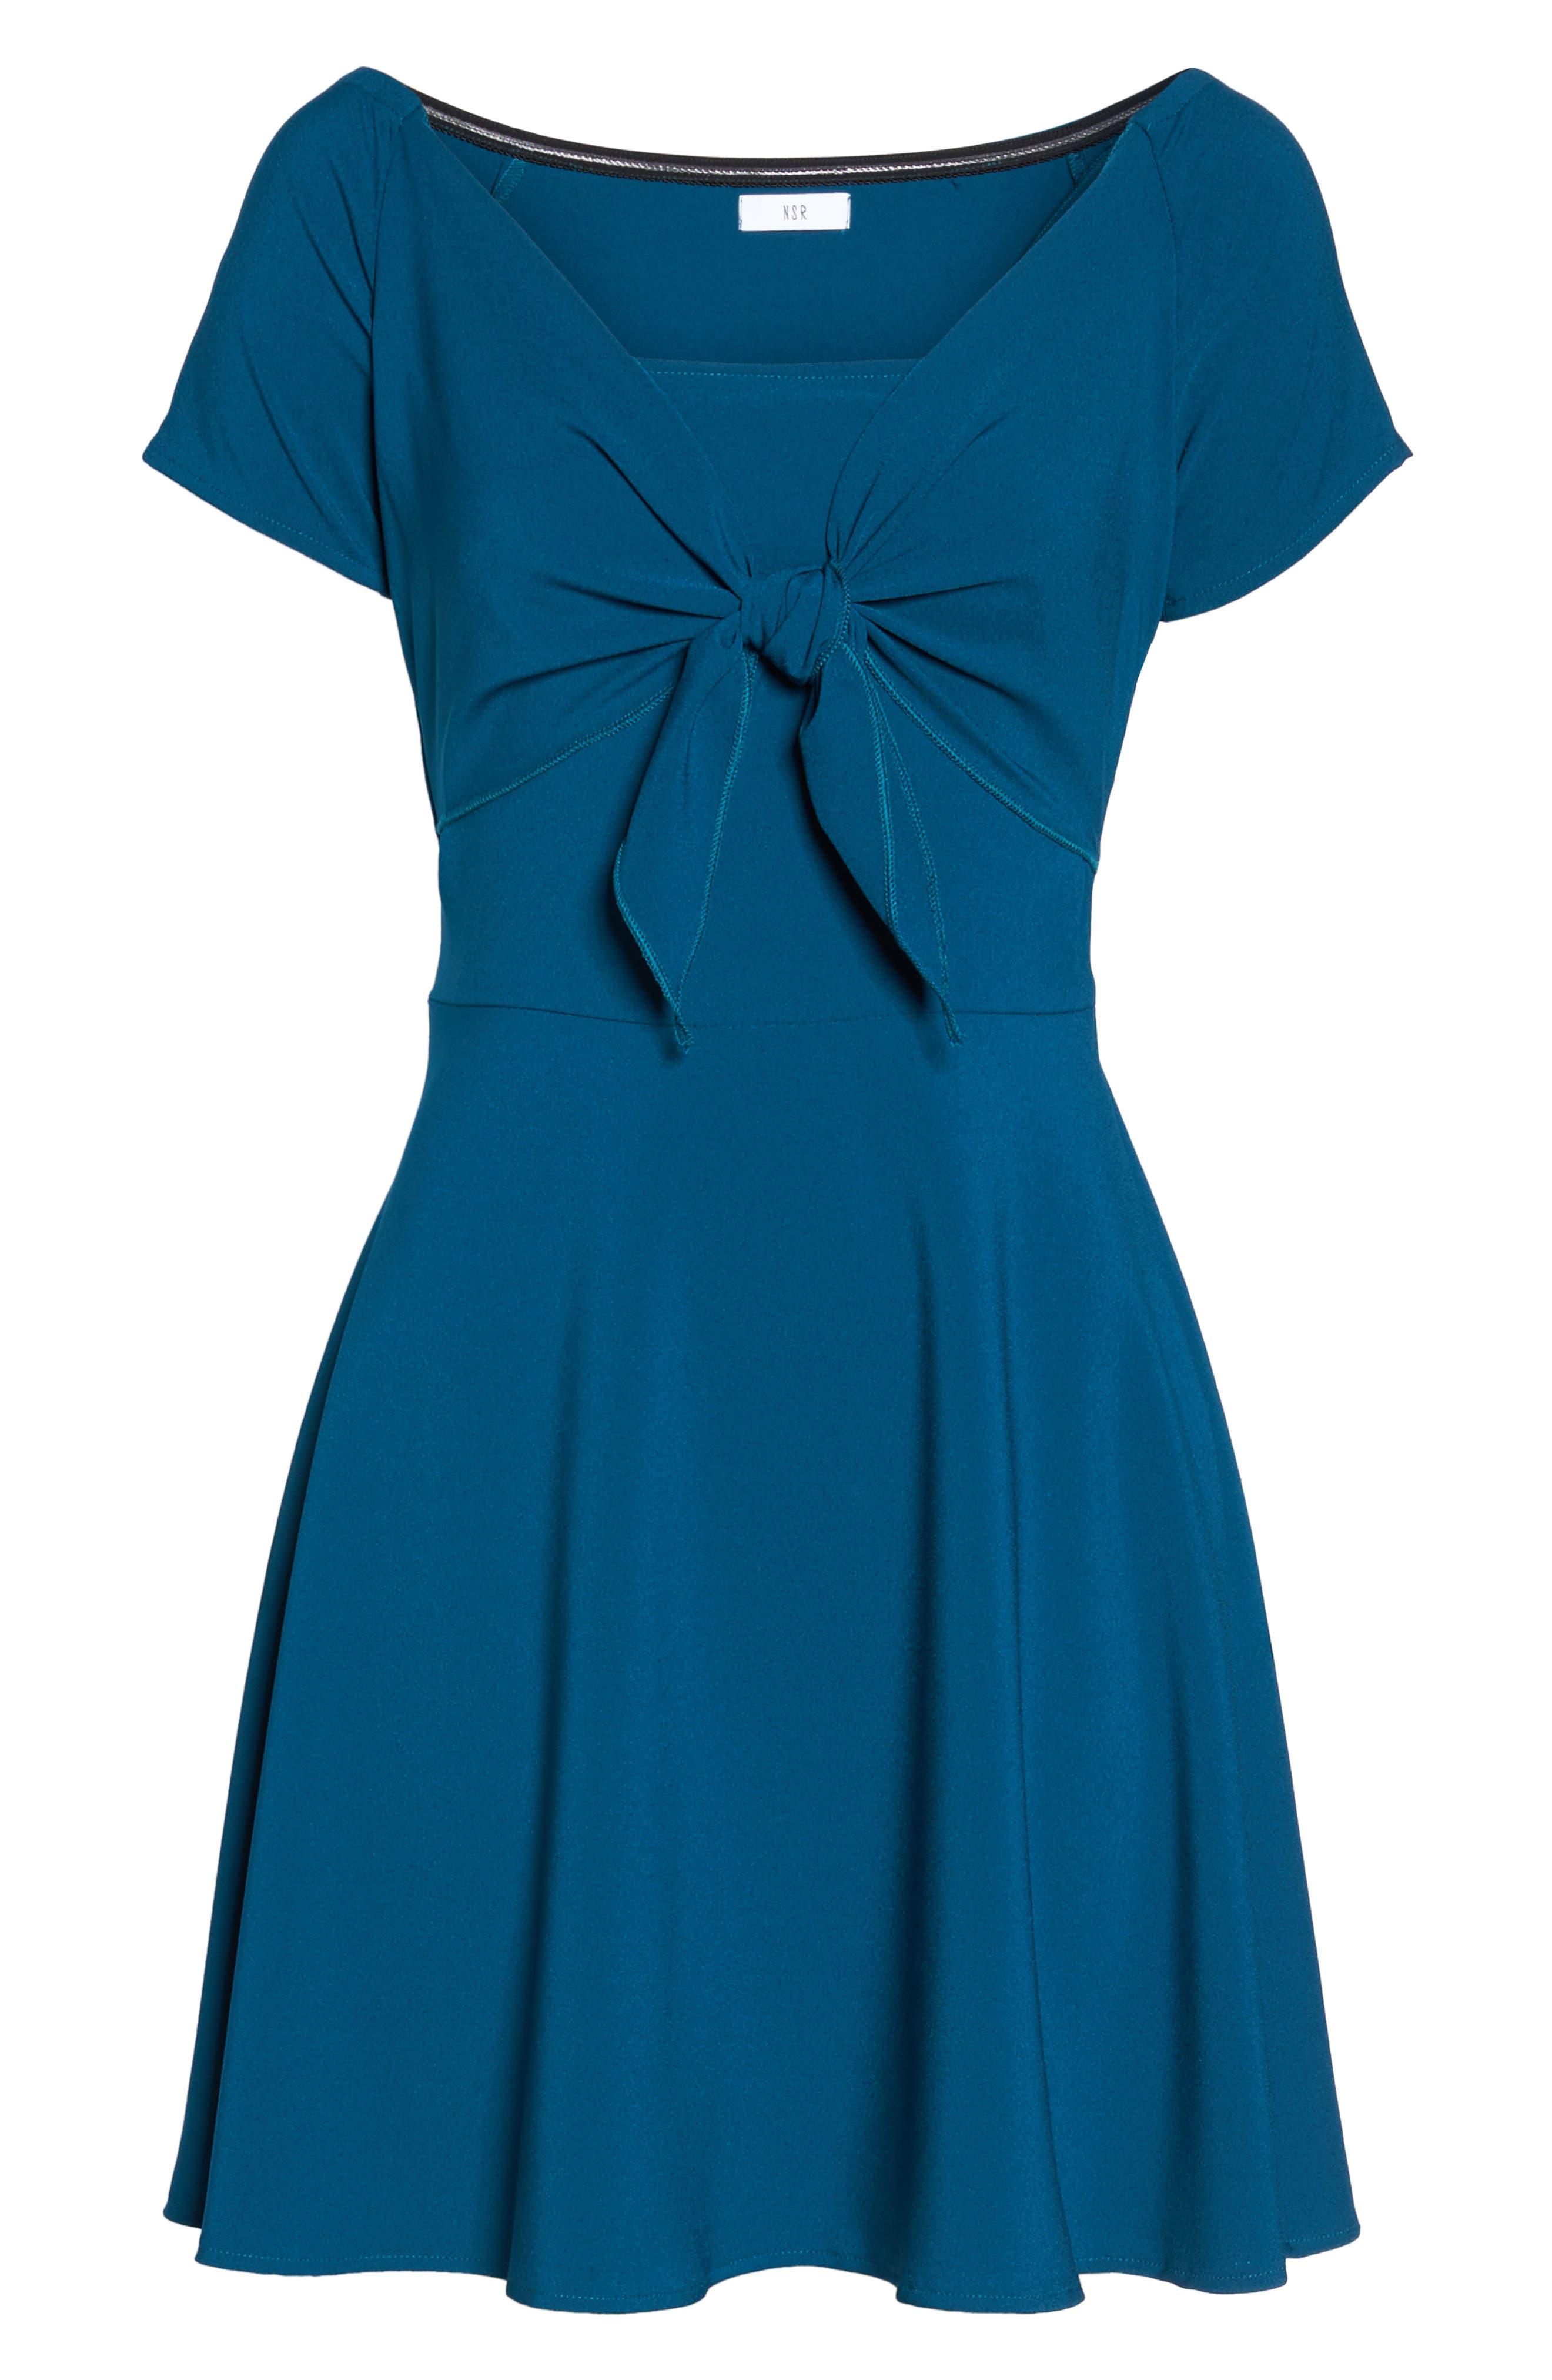 Tie Front Crepe Fit & Flare Dress,                             Alternate thumbnail 12, color,